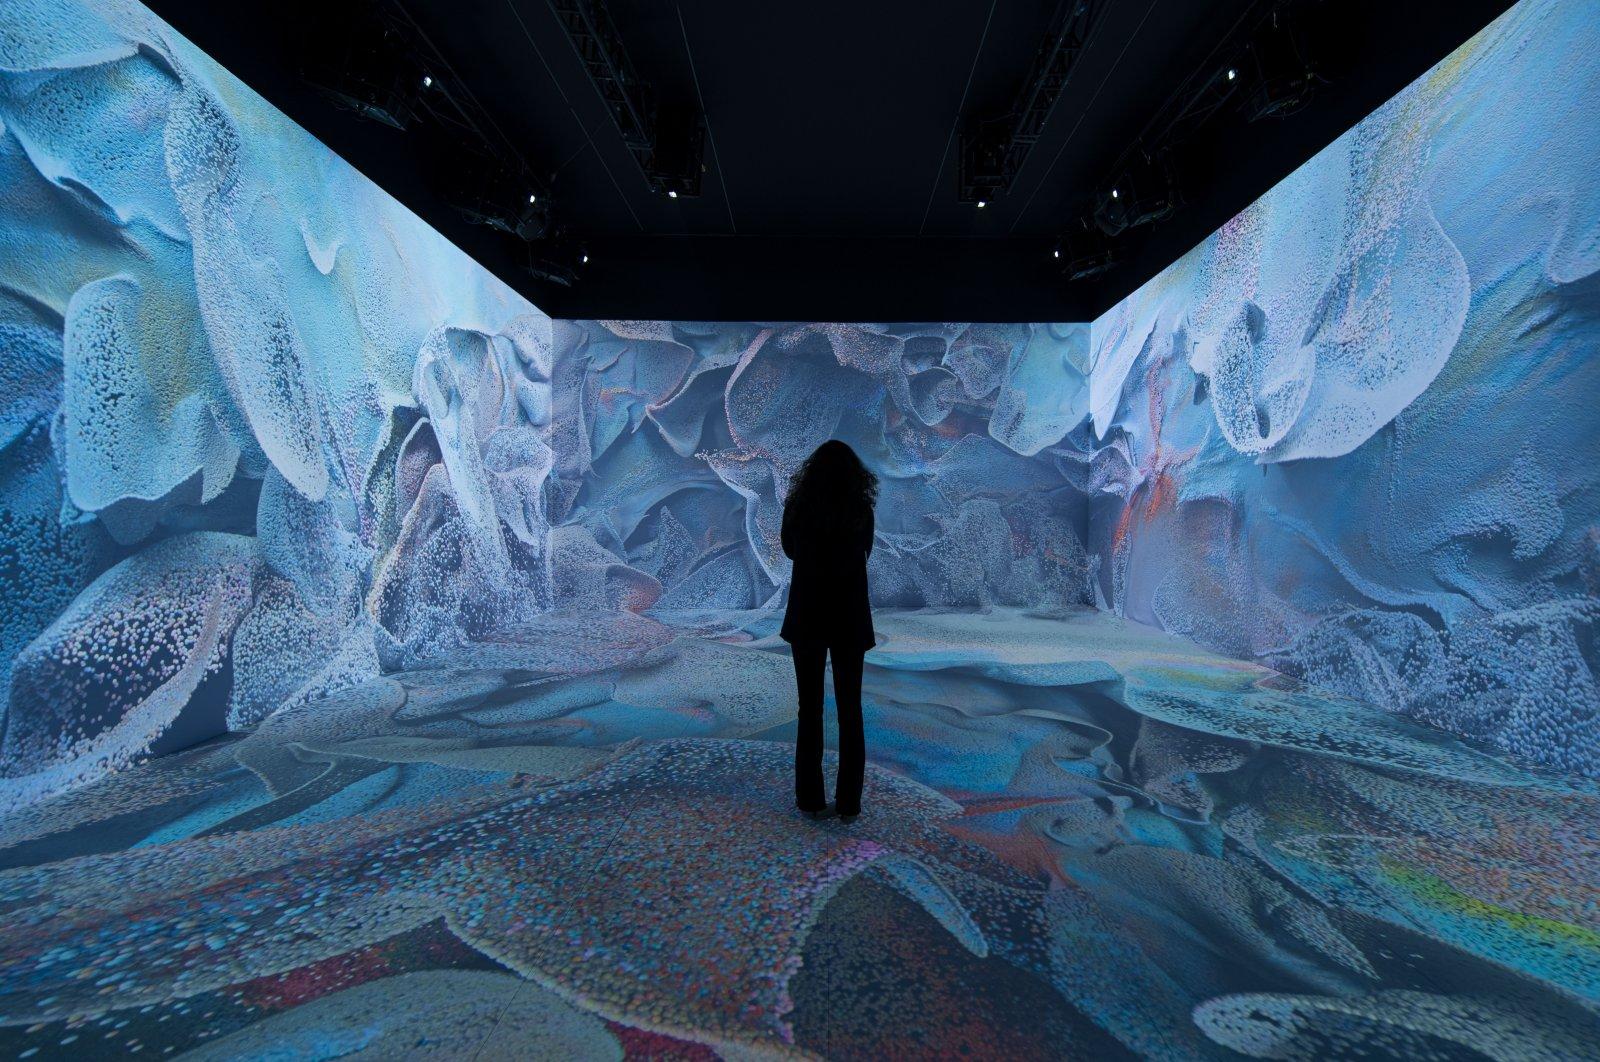 Artistic exploration of space, machine: Refik Anadol in Istanbul